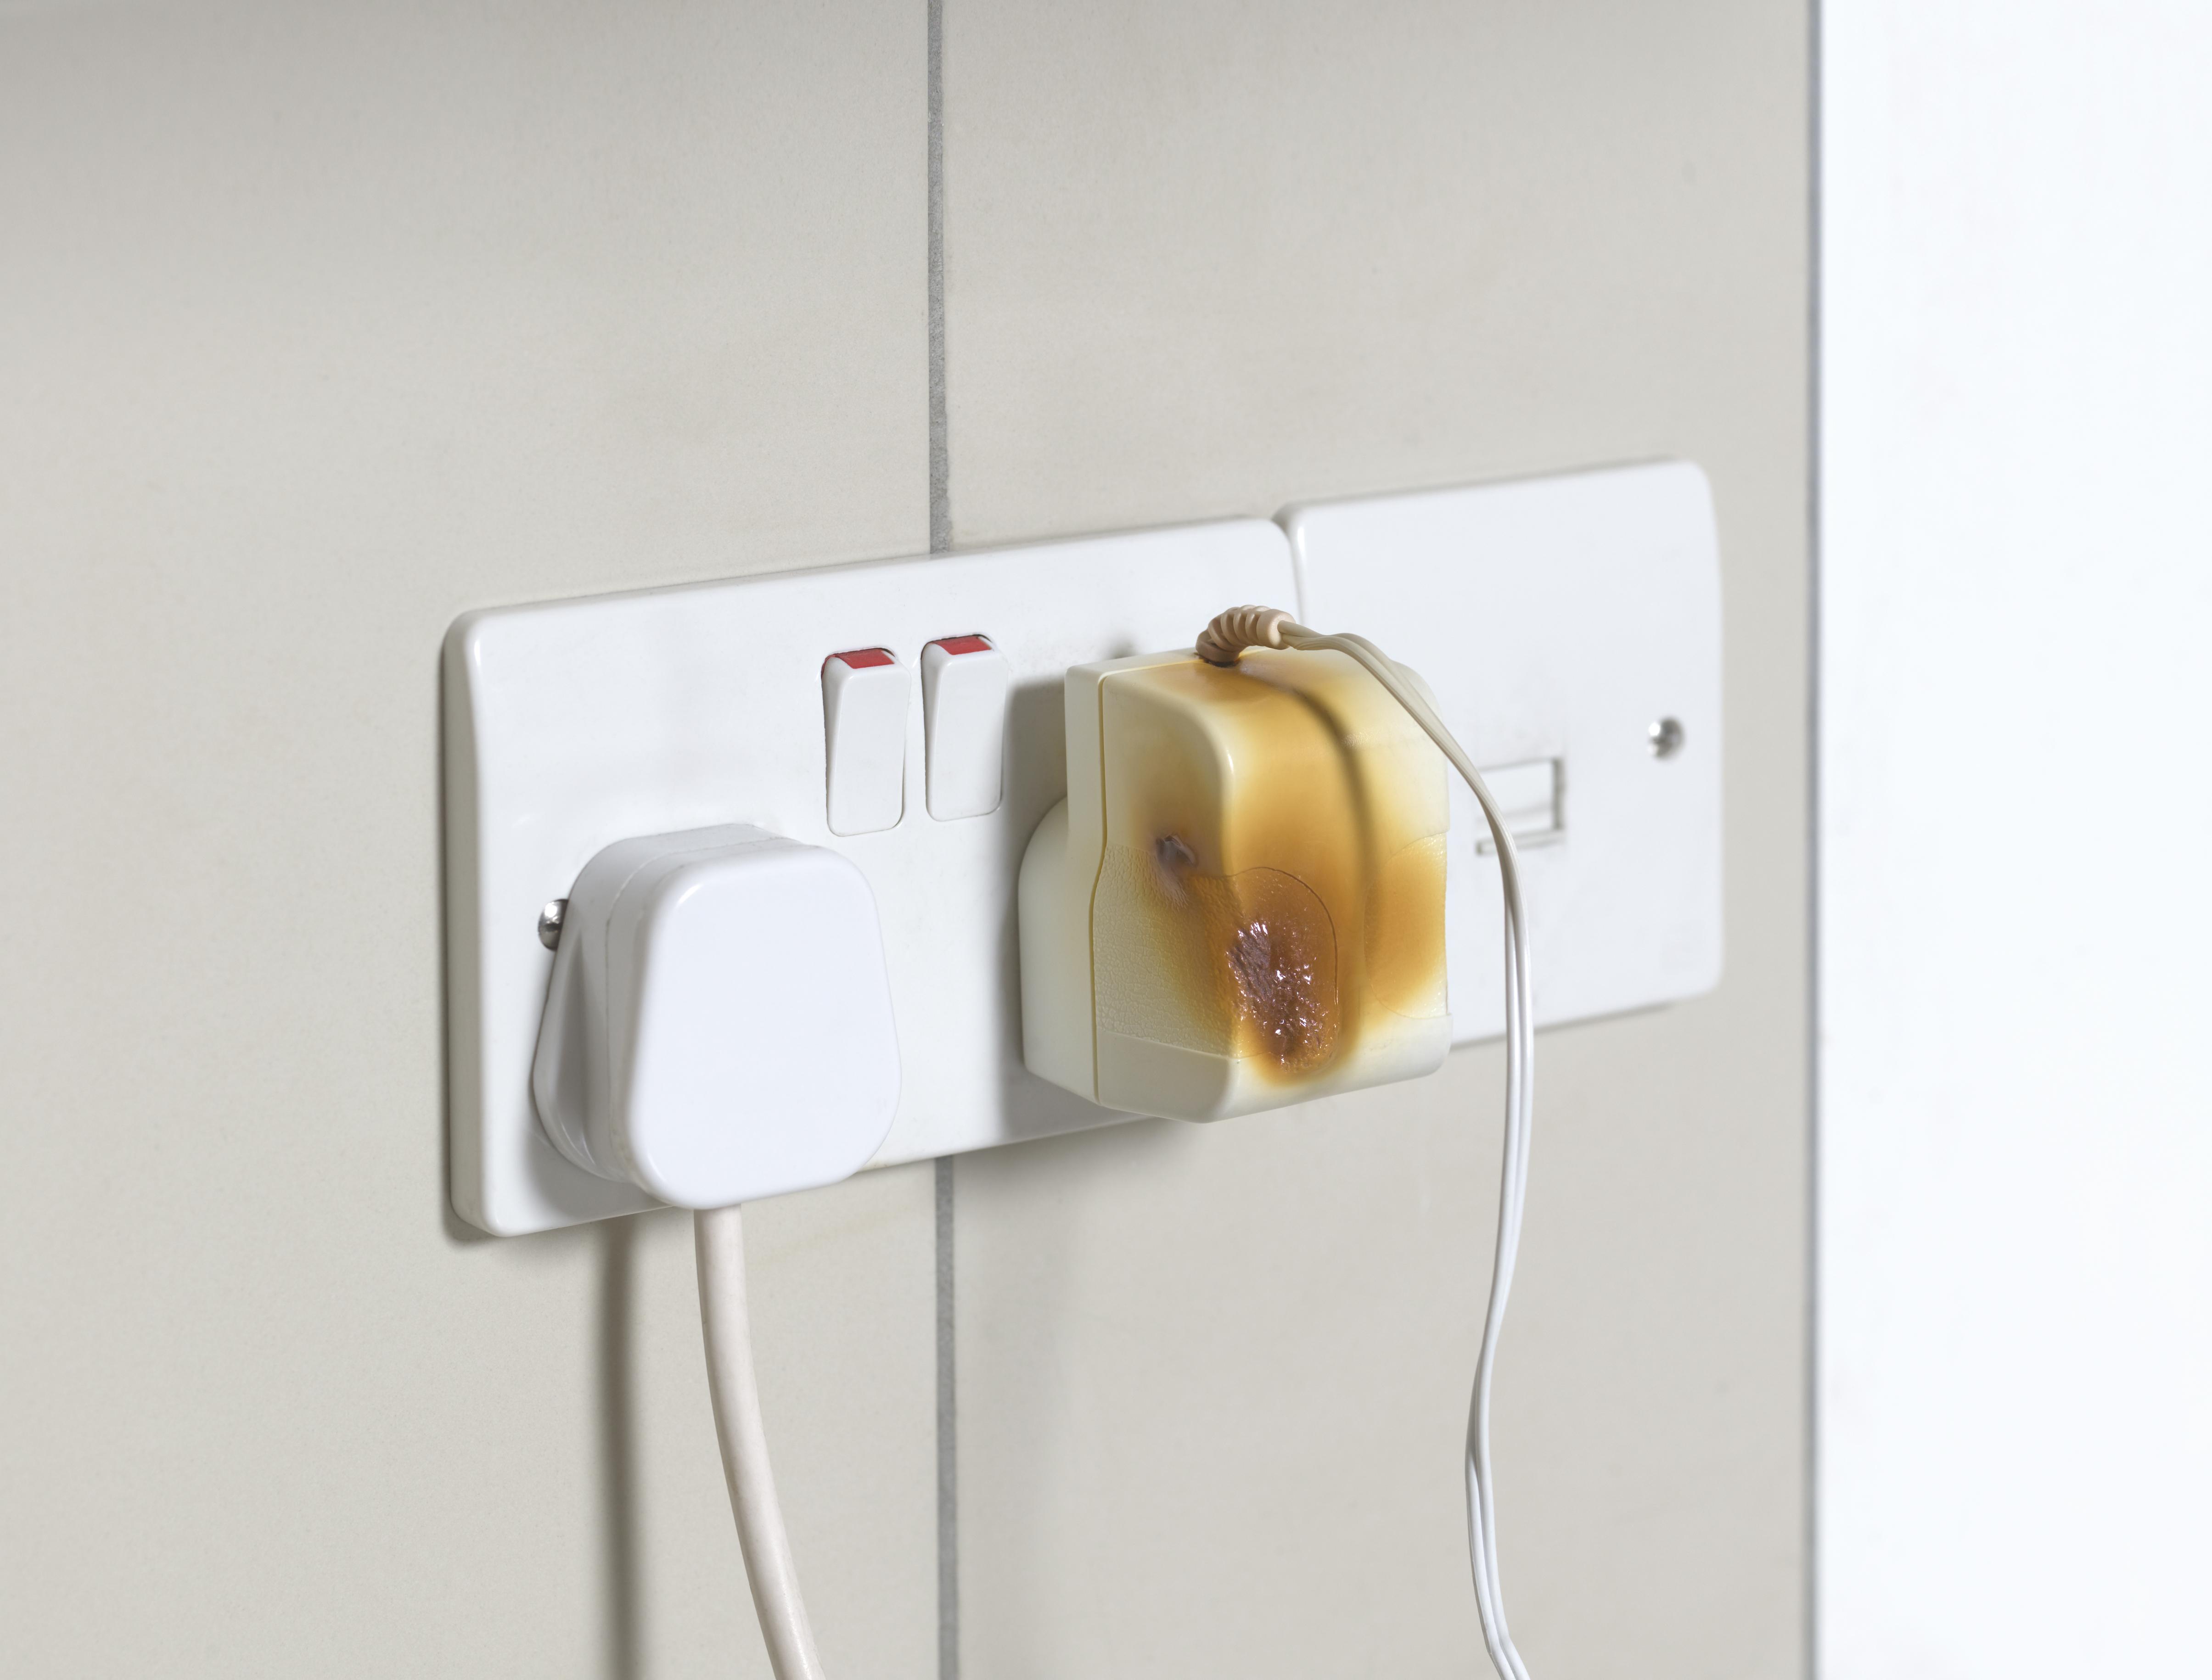 Power plug fire